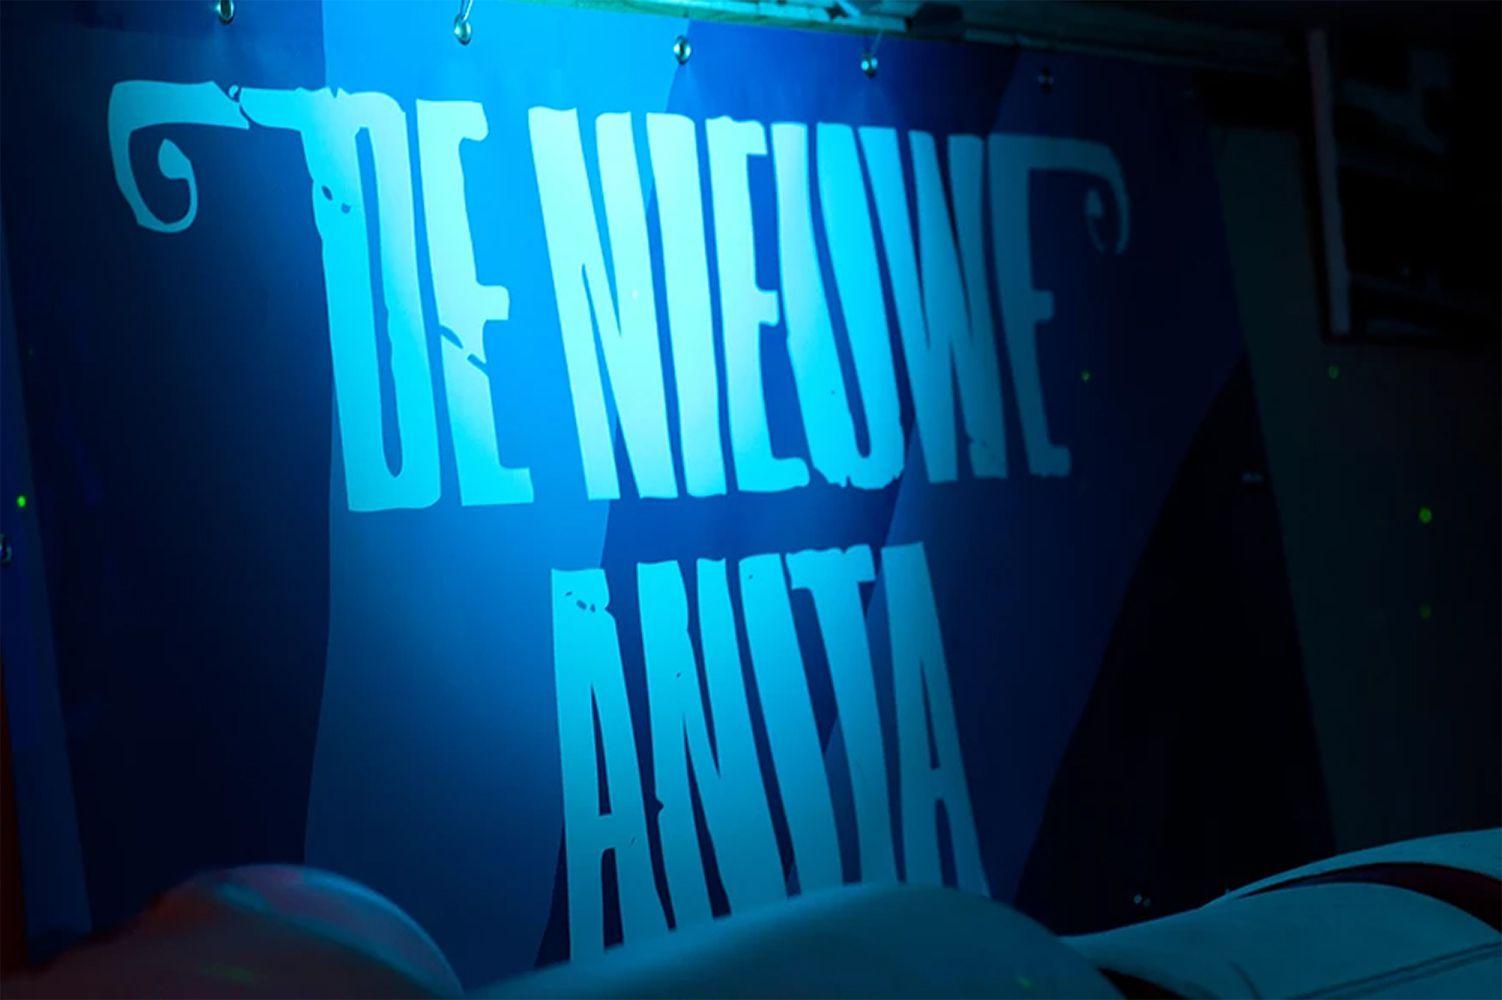 A sign for the music venue De Nieuwe Anita